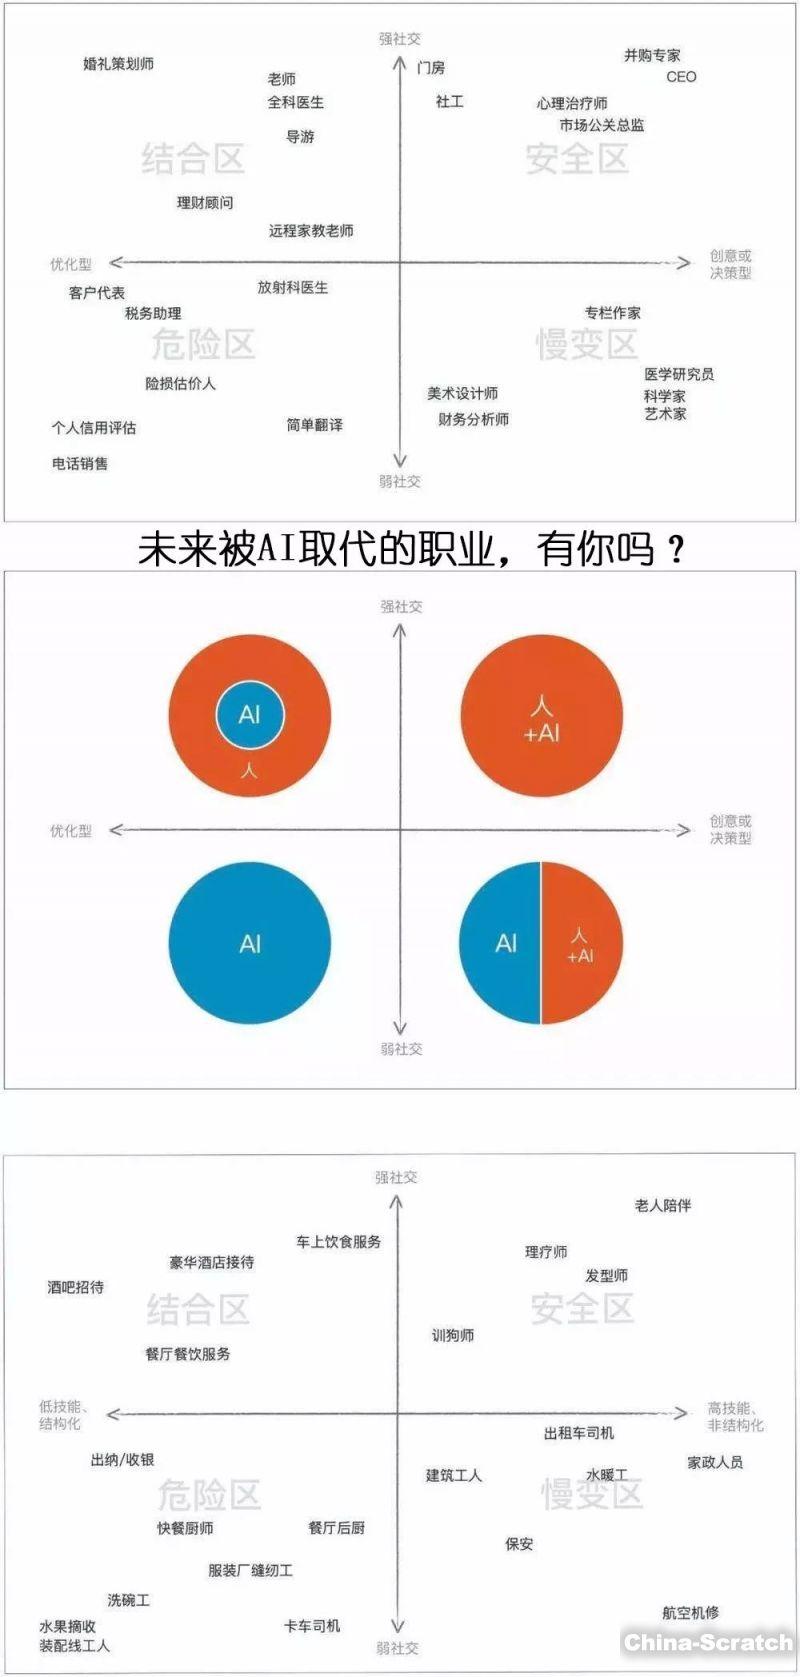 http://www.china-scratch.com/Uploads/timg/190522/10464GQ2-3.jpg